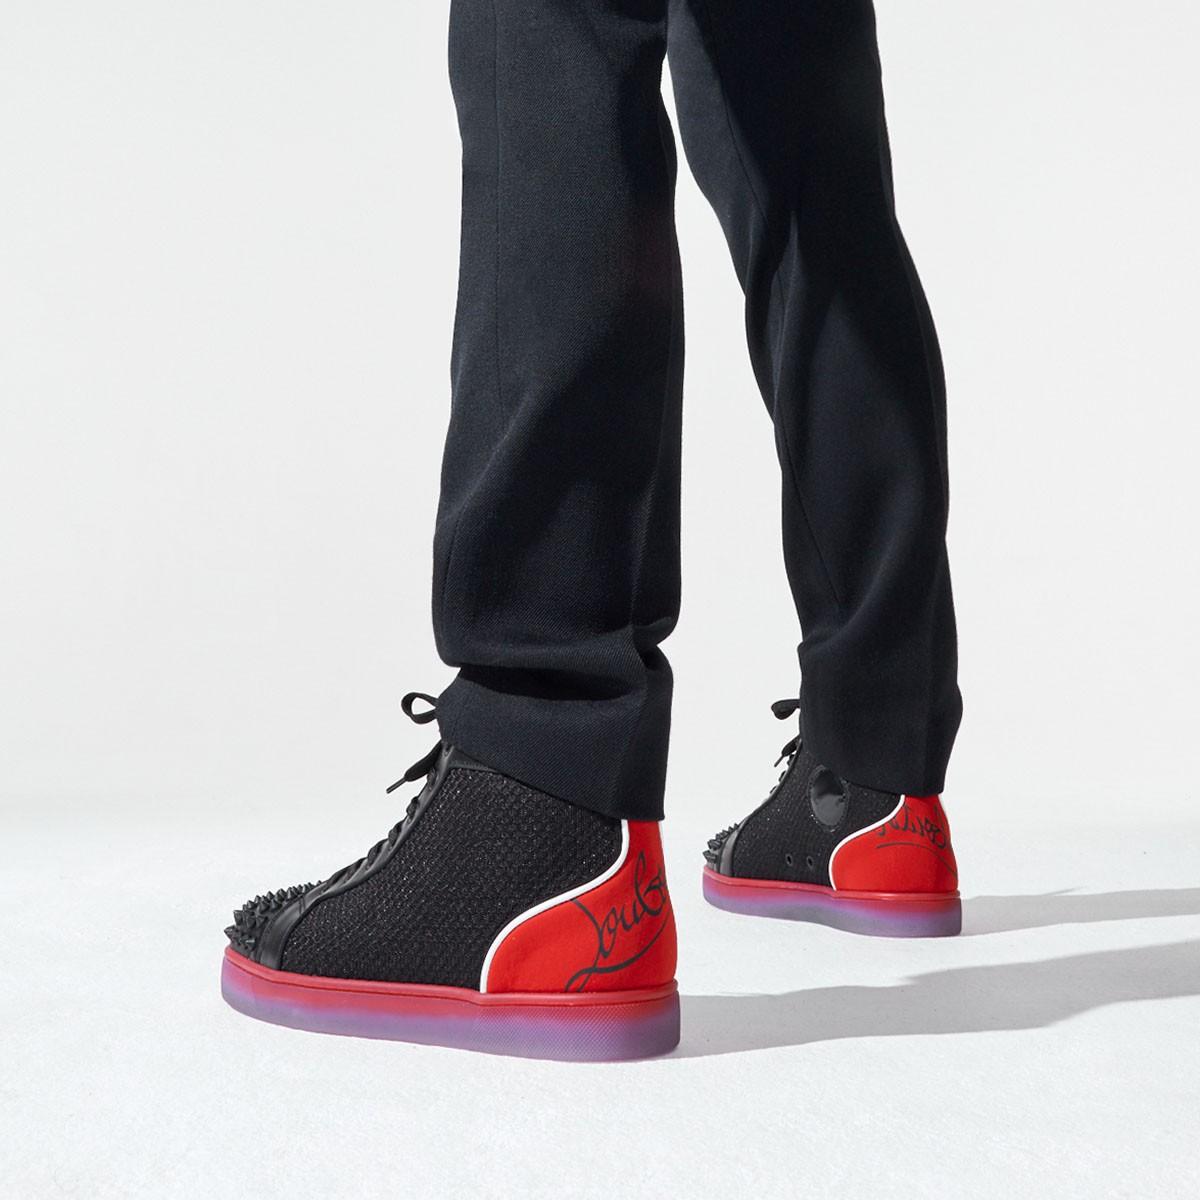 Shoes - Fun Lou Spikes - Christian Louboutin